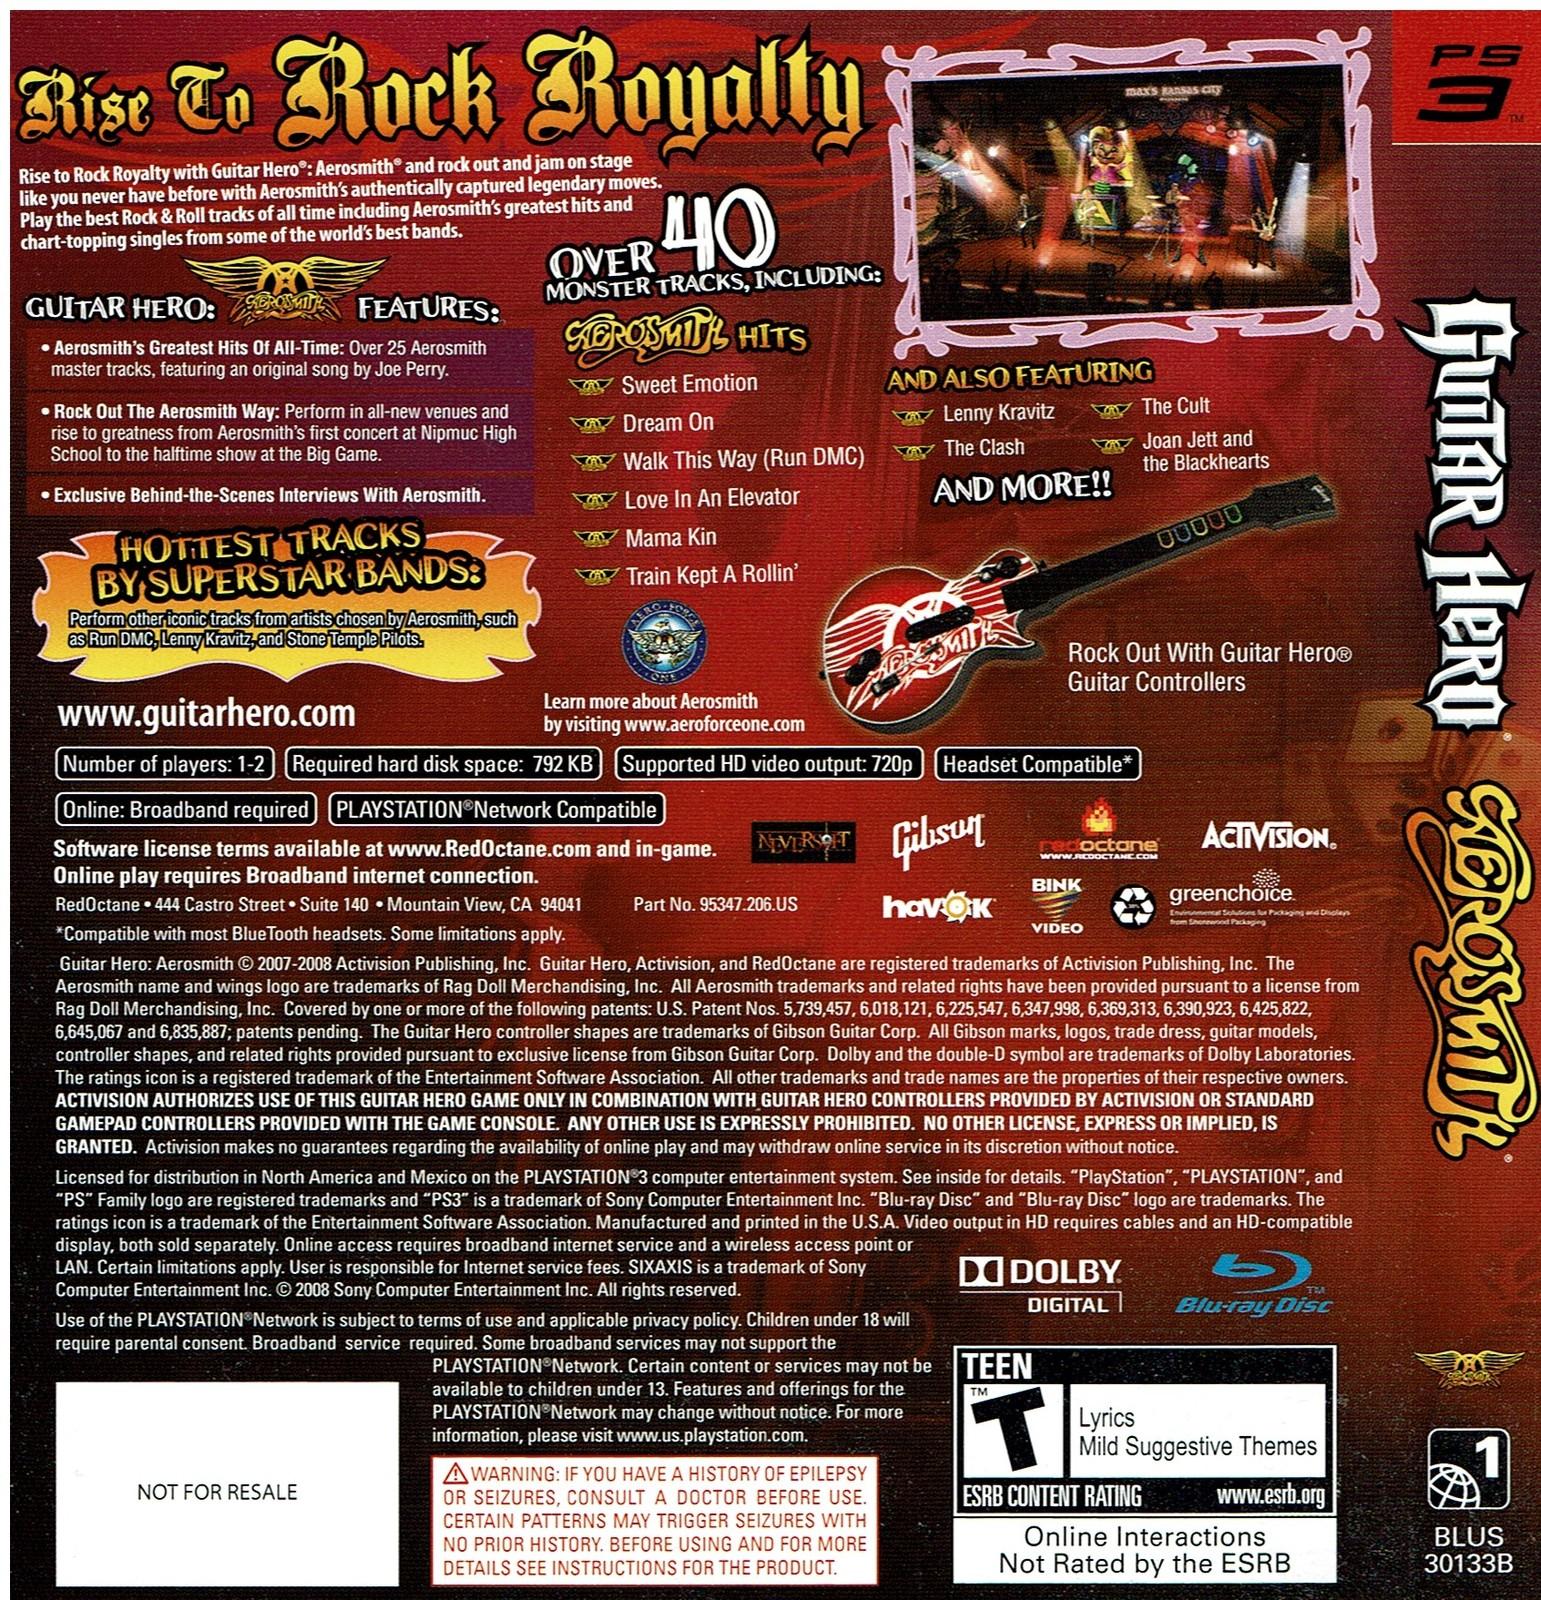 Guitar Hero Aerosmith, Playstation 3, PS3, (BLUS-30133B)(0047875953352)